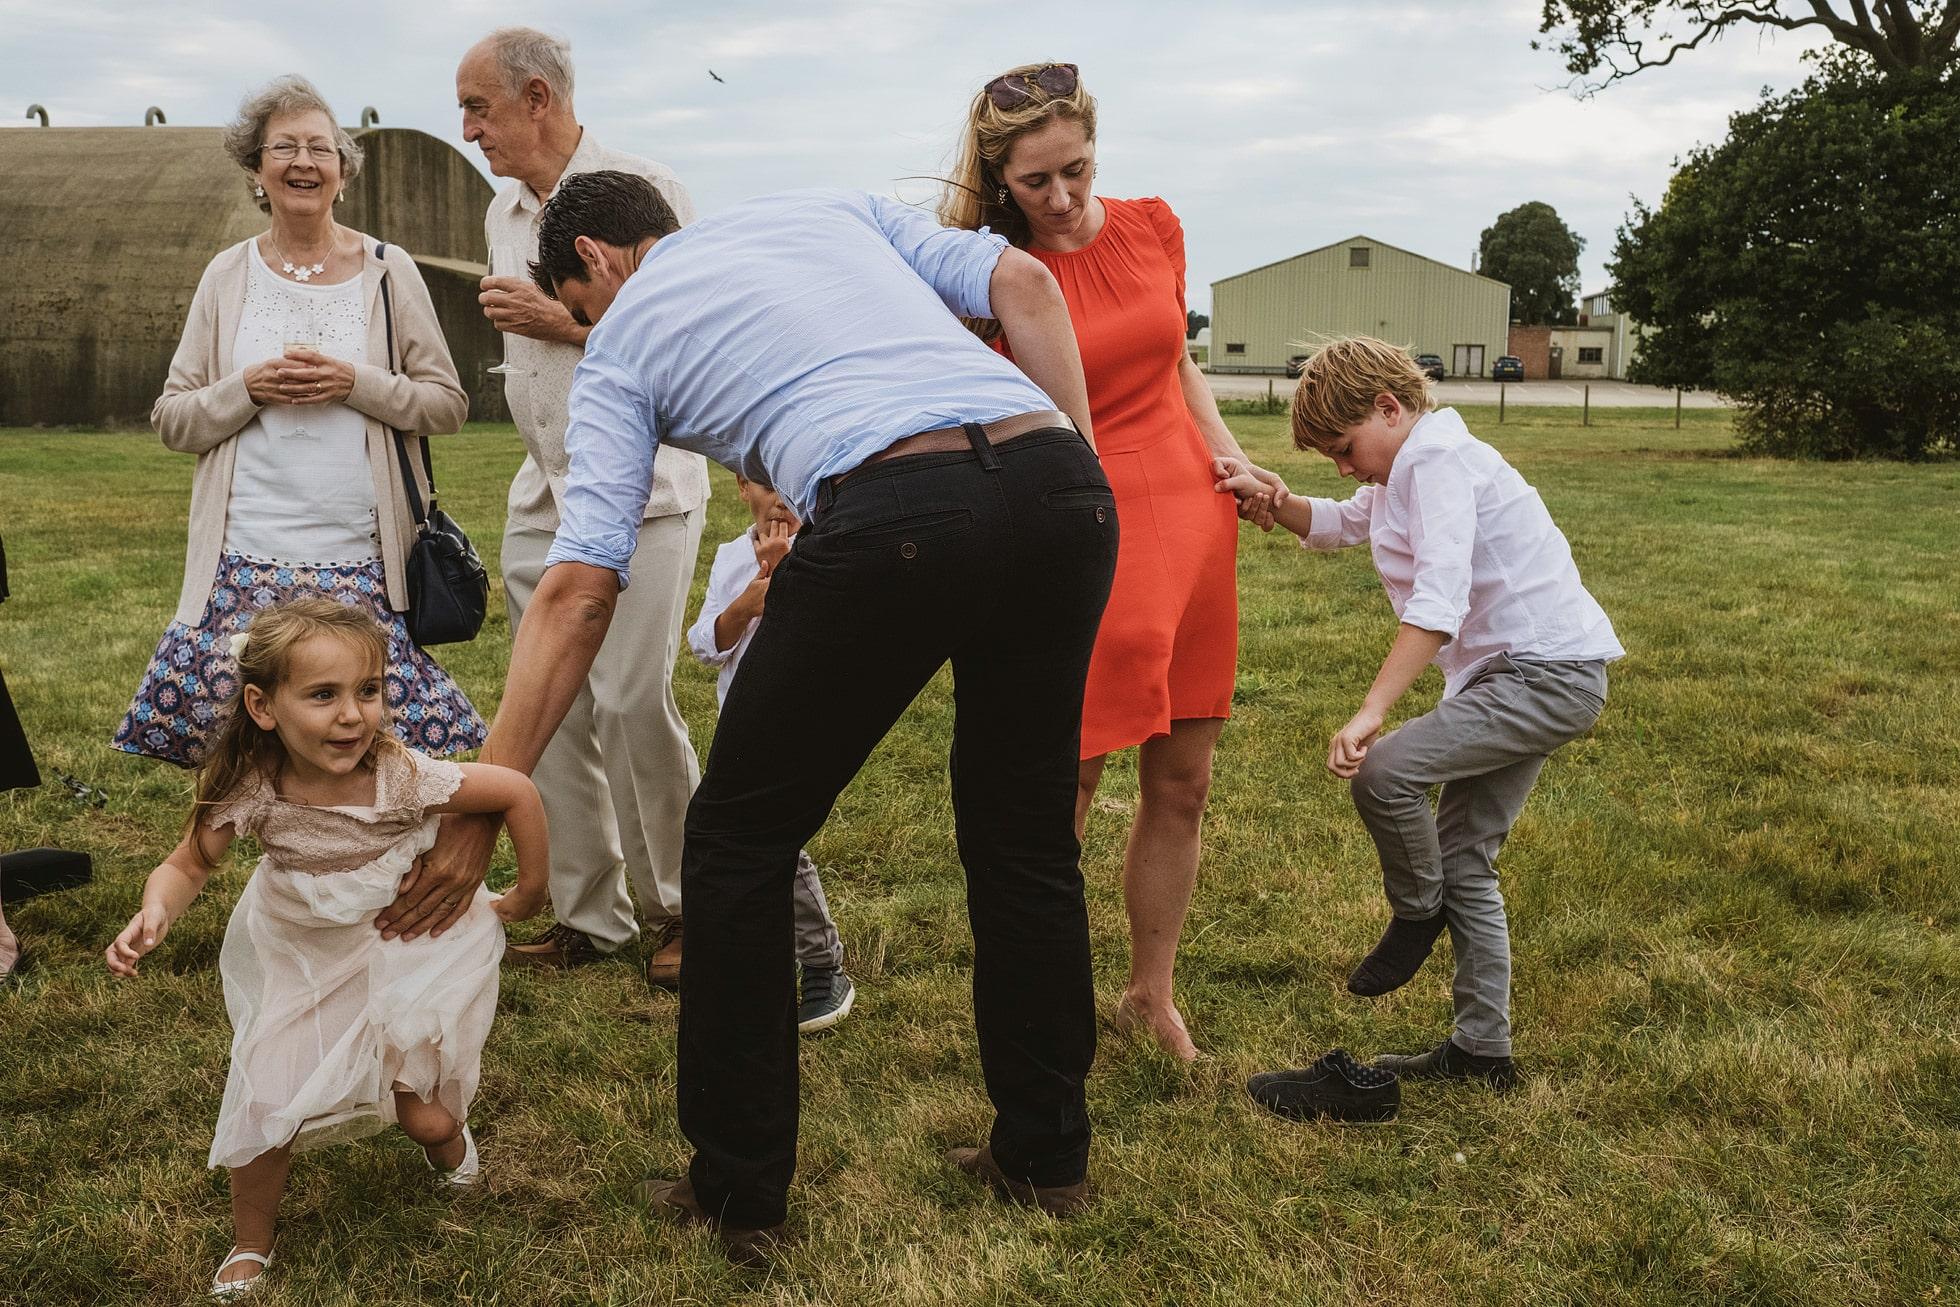 suffolk reportage wedding photographers